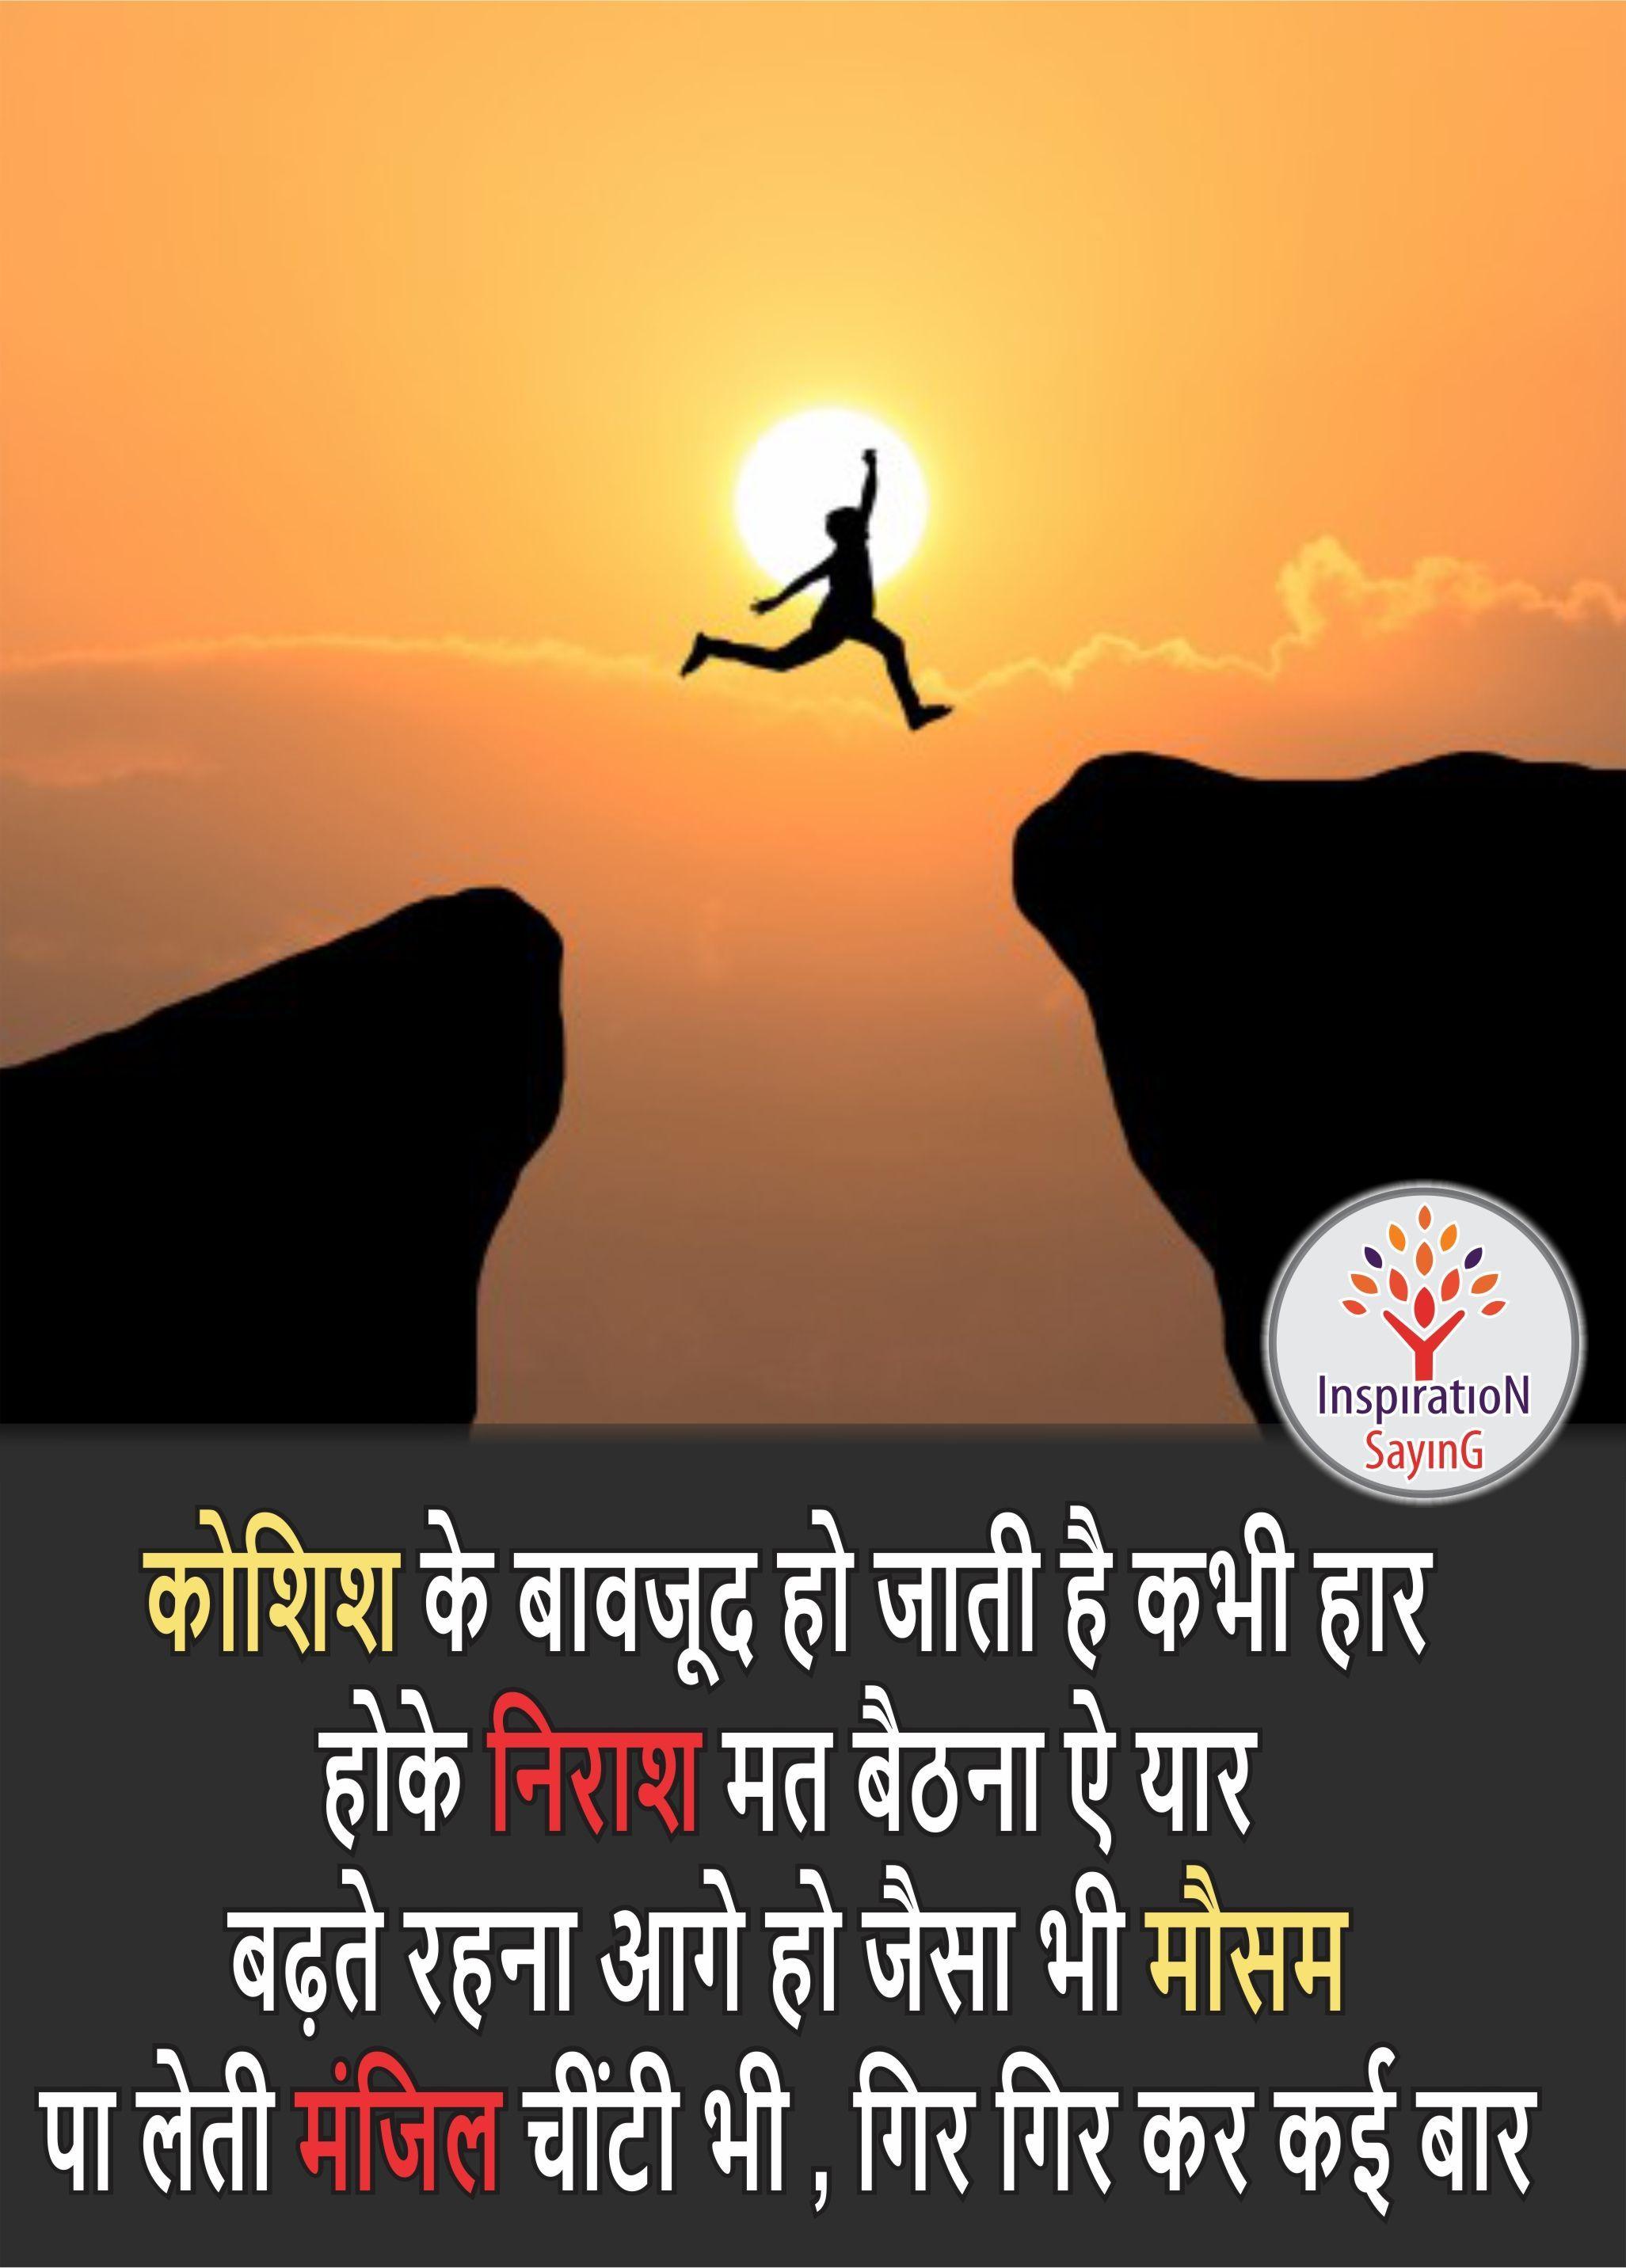 Quotesinspirational Quotes Motivation In Hindi